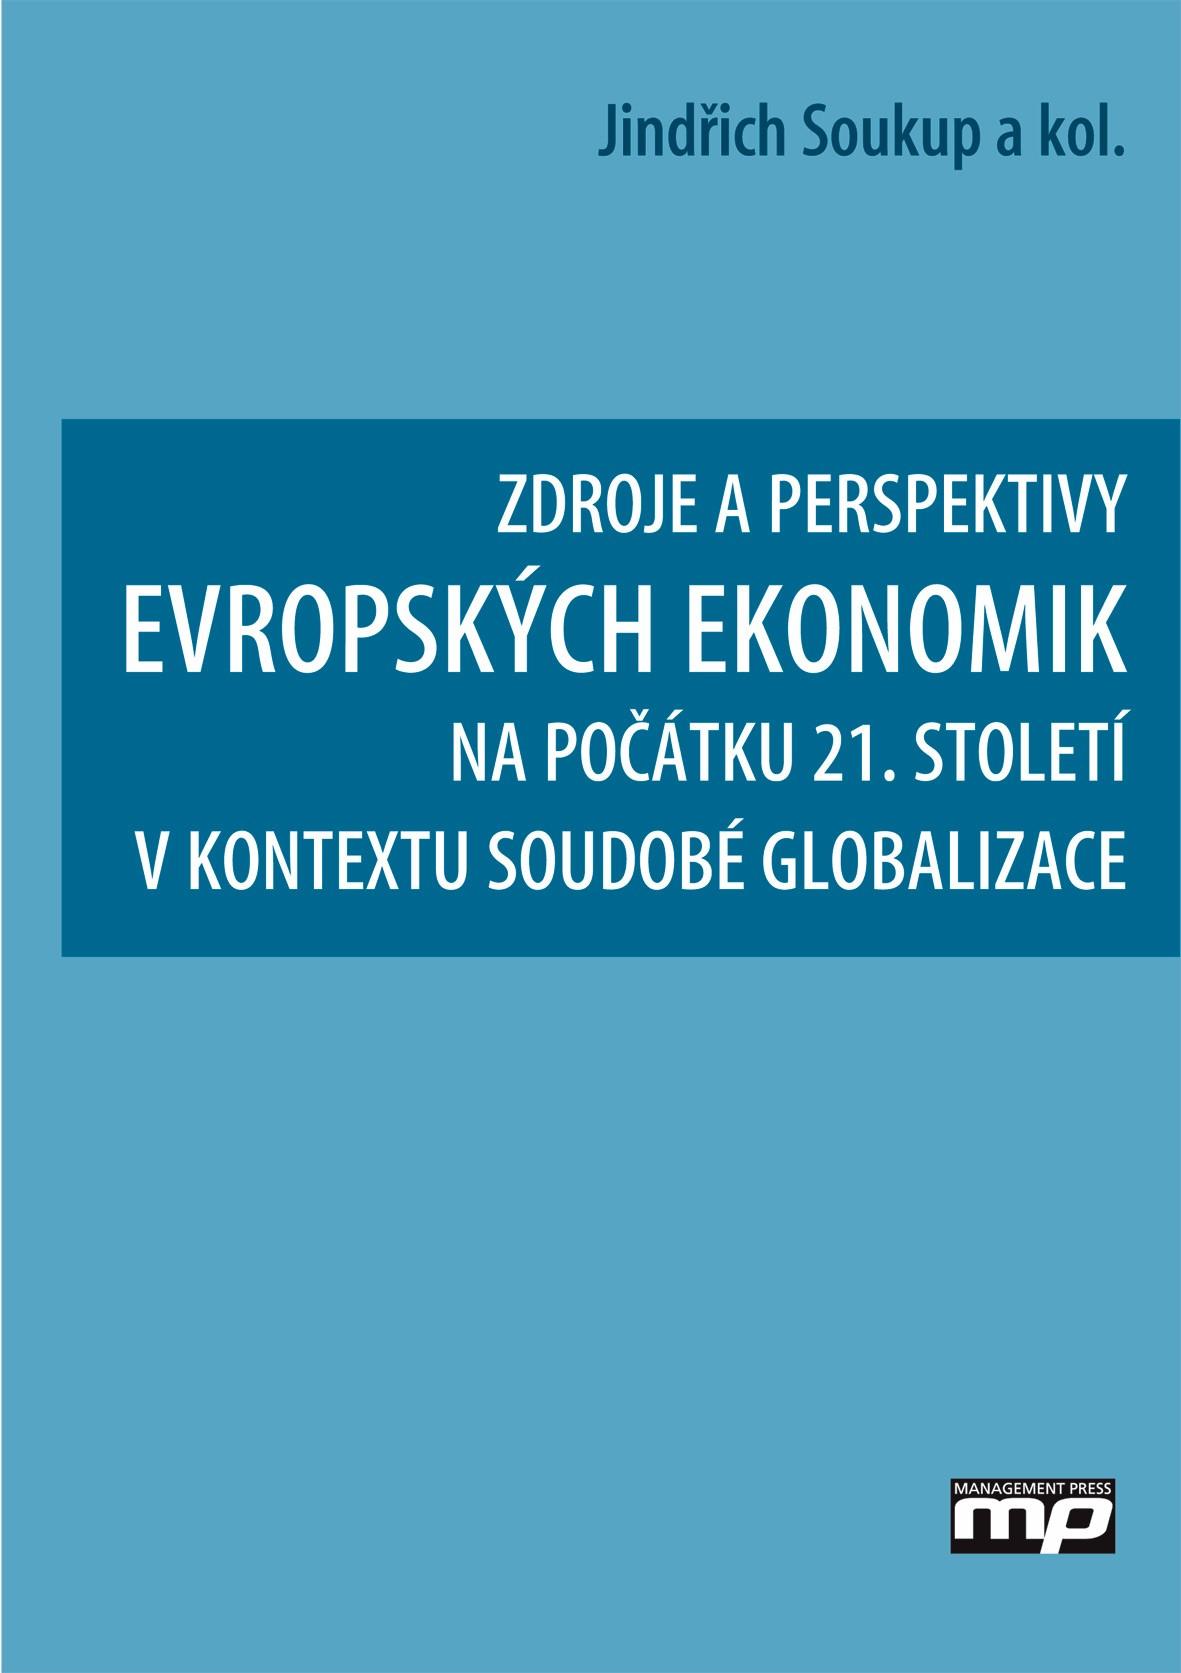 Zdroje a perspektivy evropských ekonomik